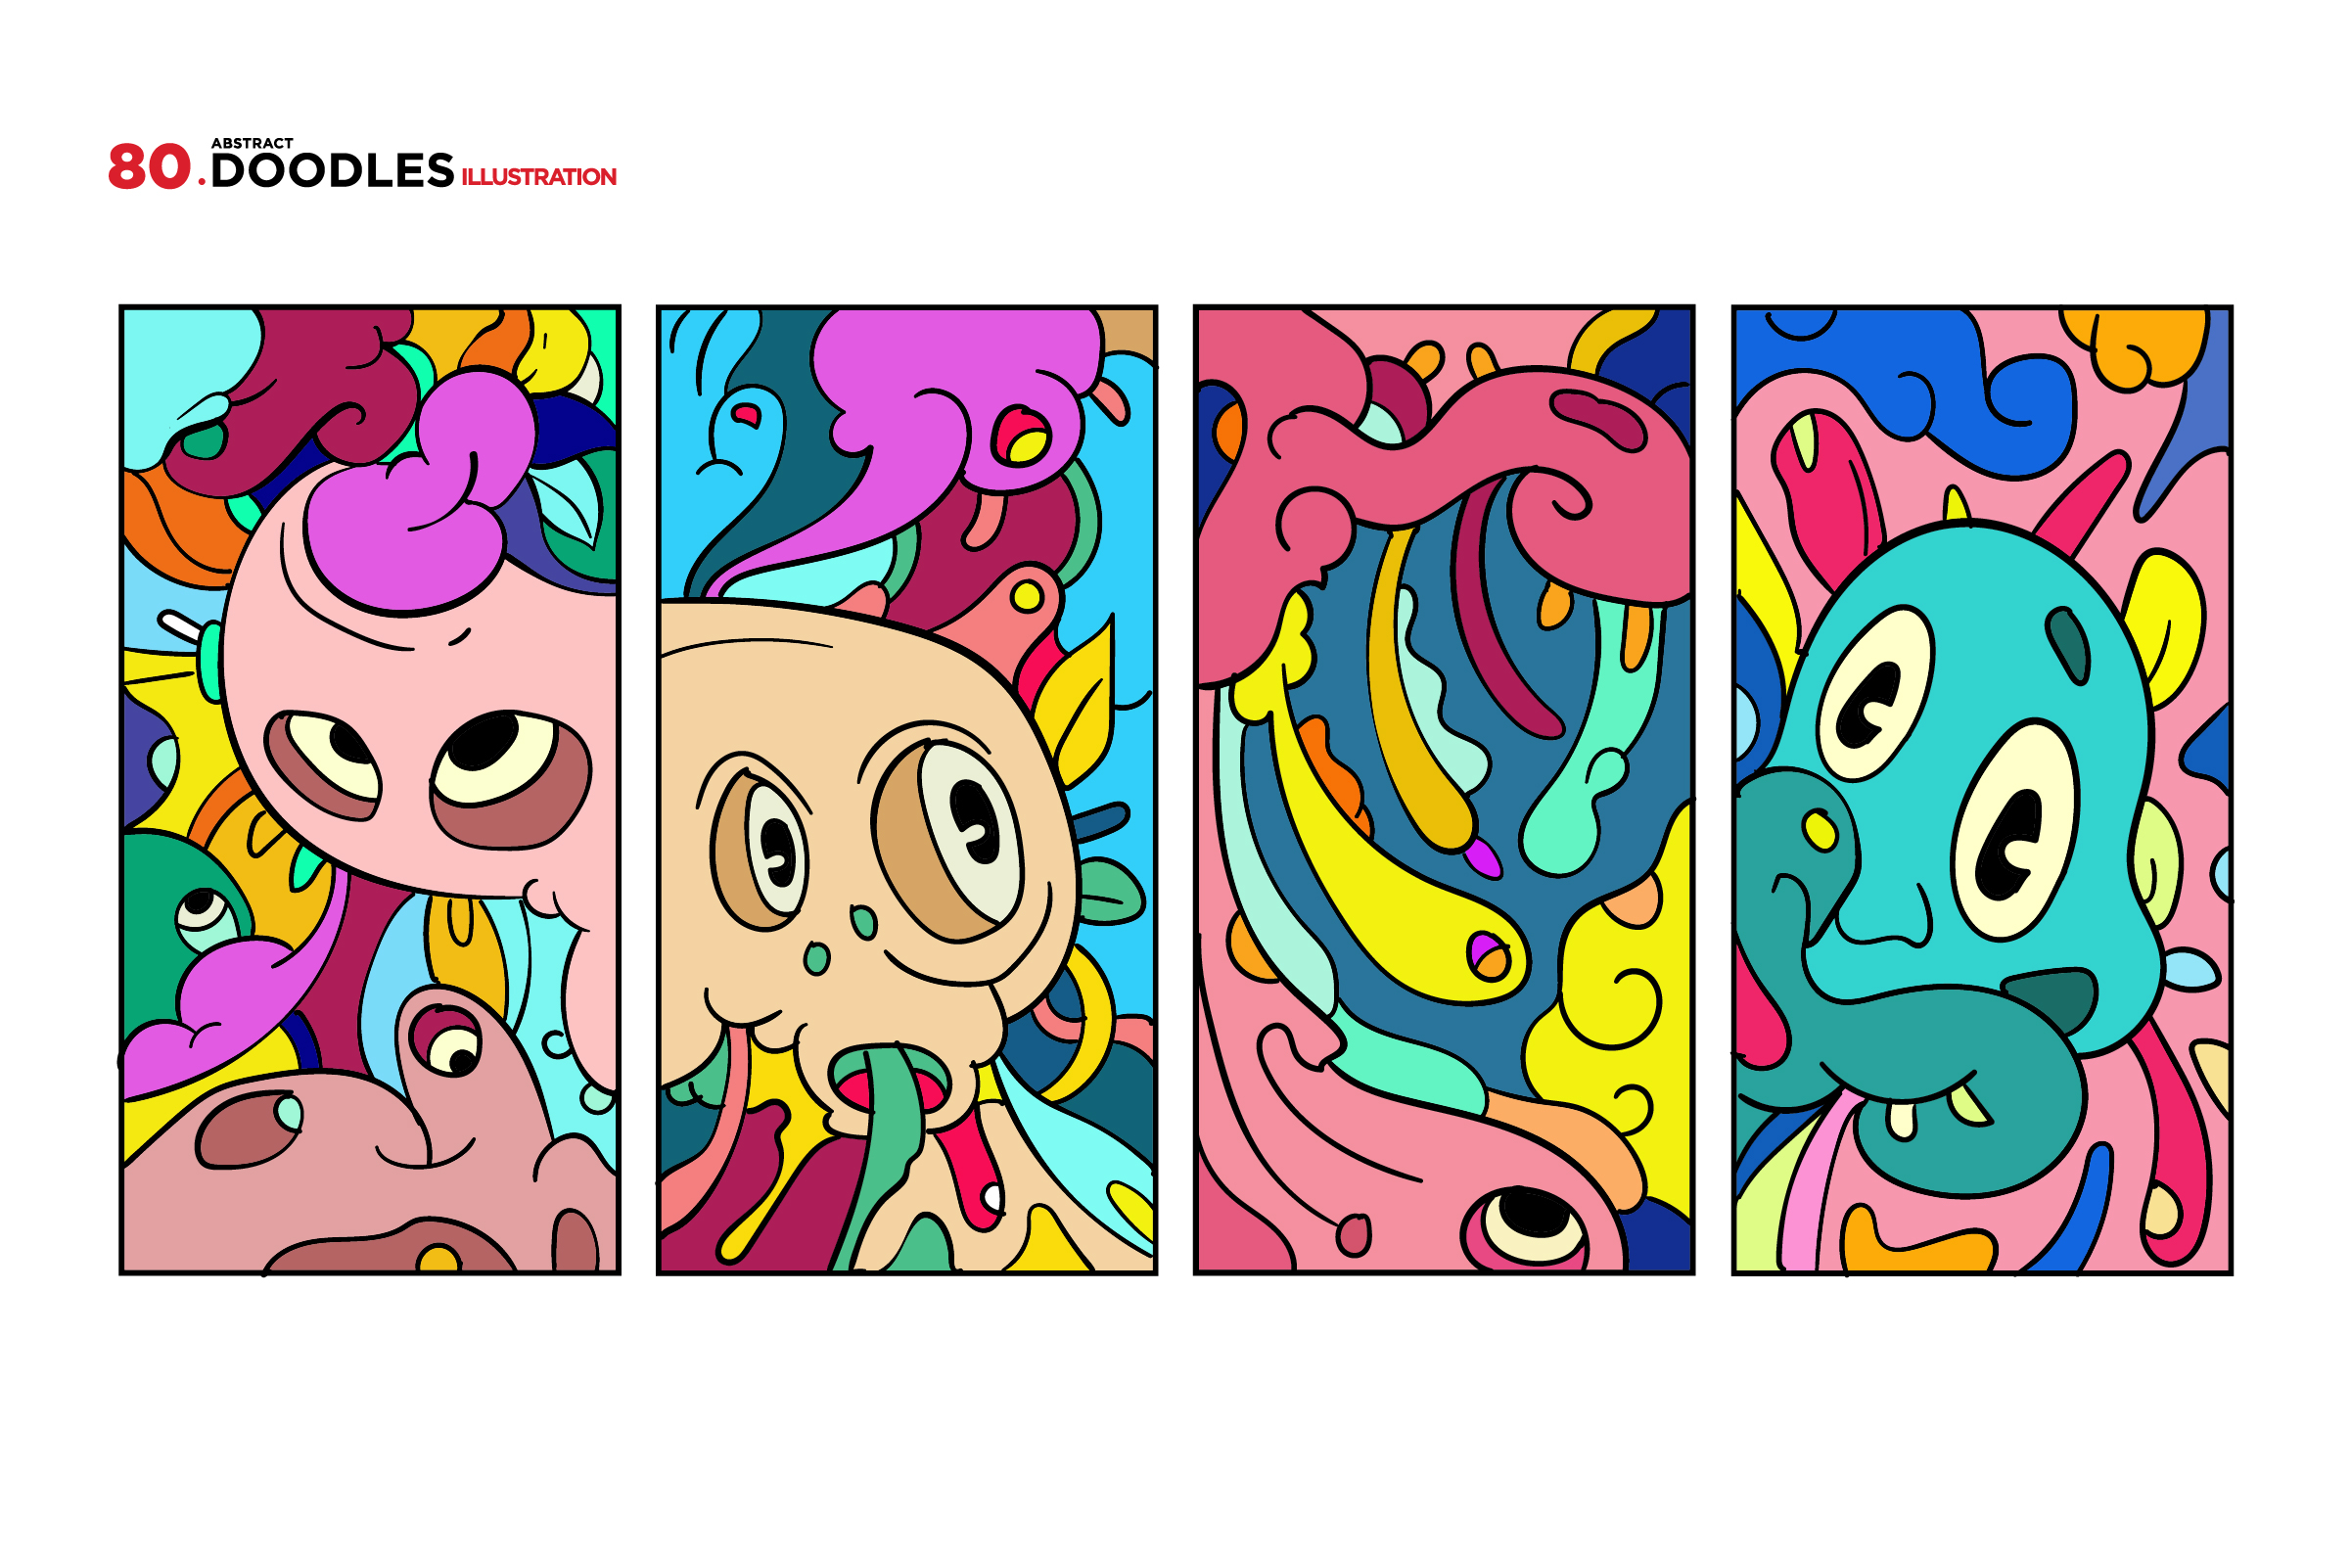 80 Cartoon Doodle Illustrations example image 9